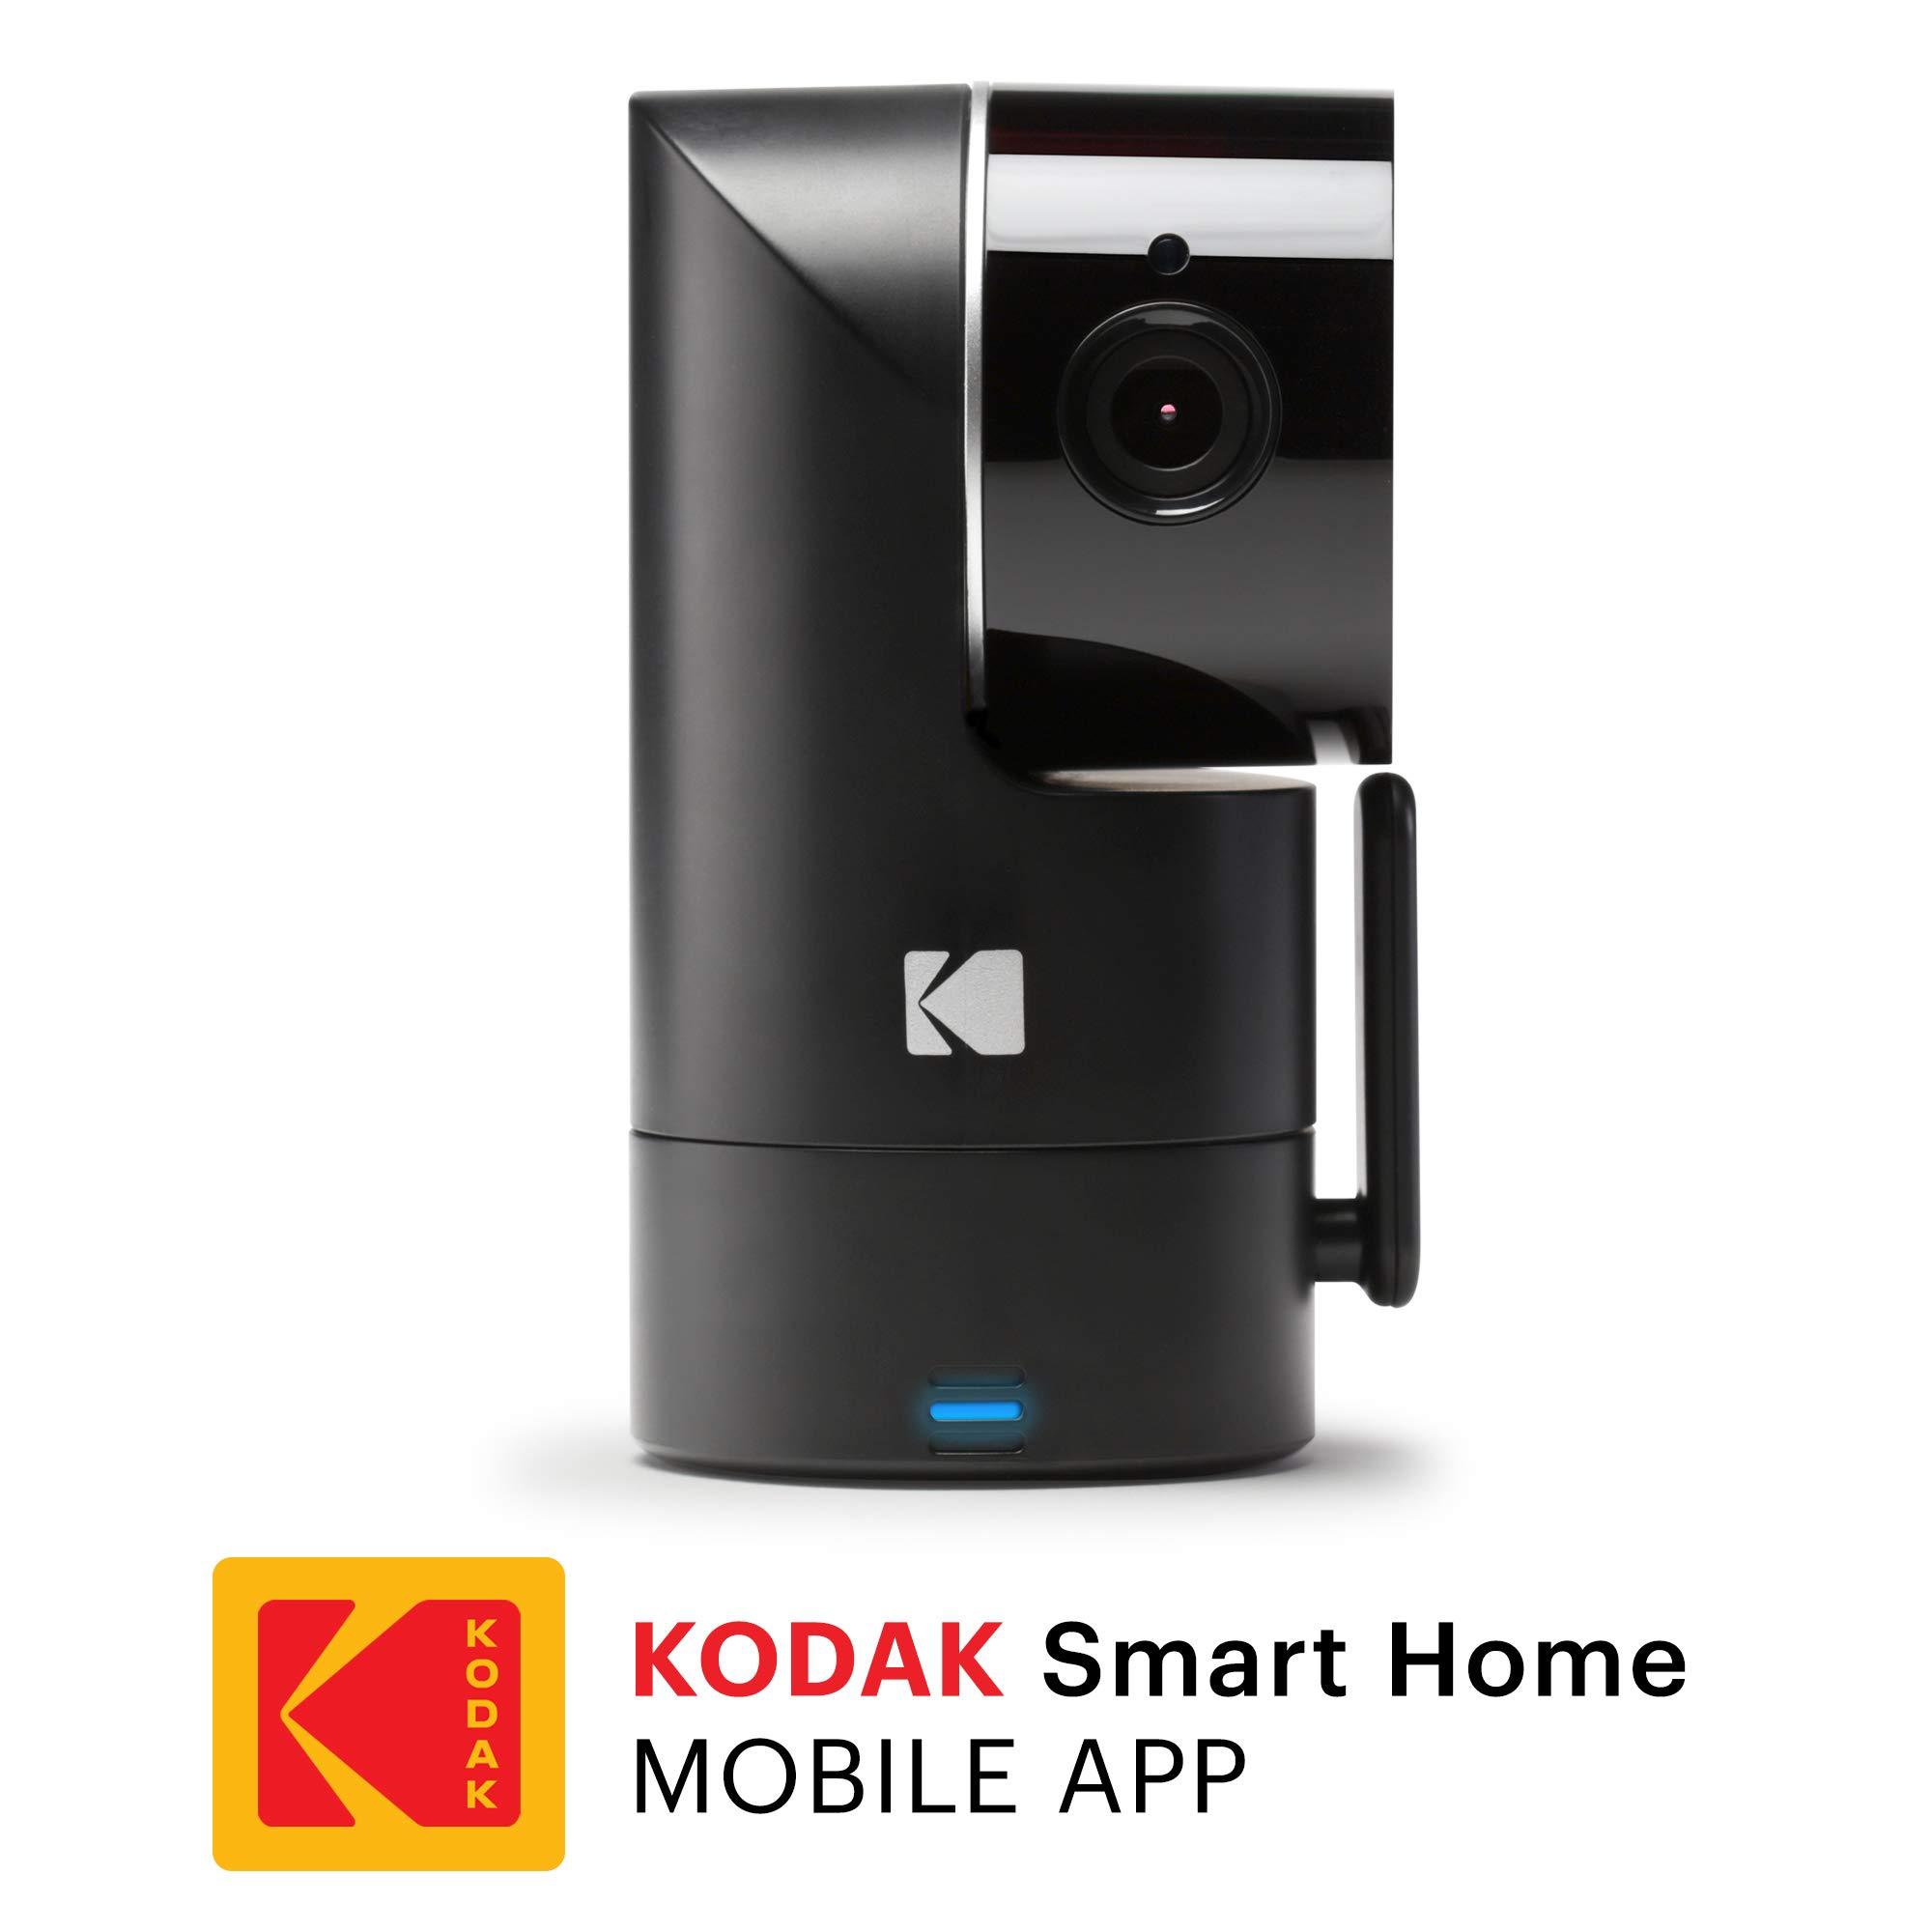 Amazon.com : KODAK Cherish C525 Video Baby Monitor with